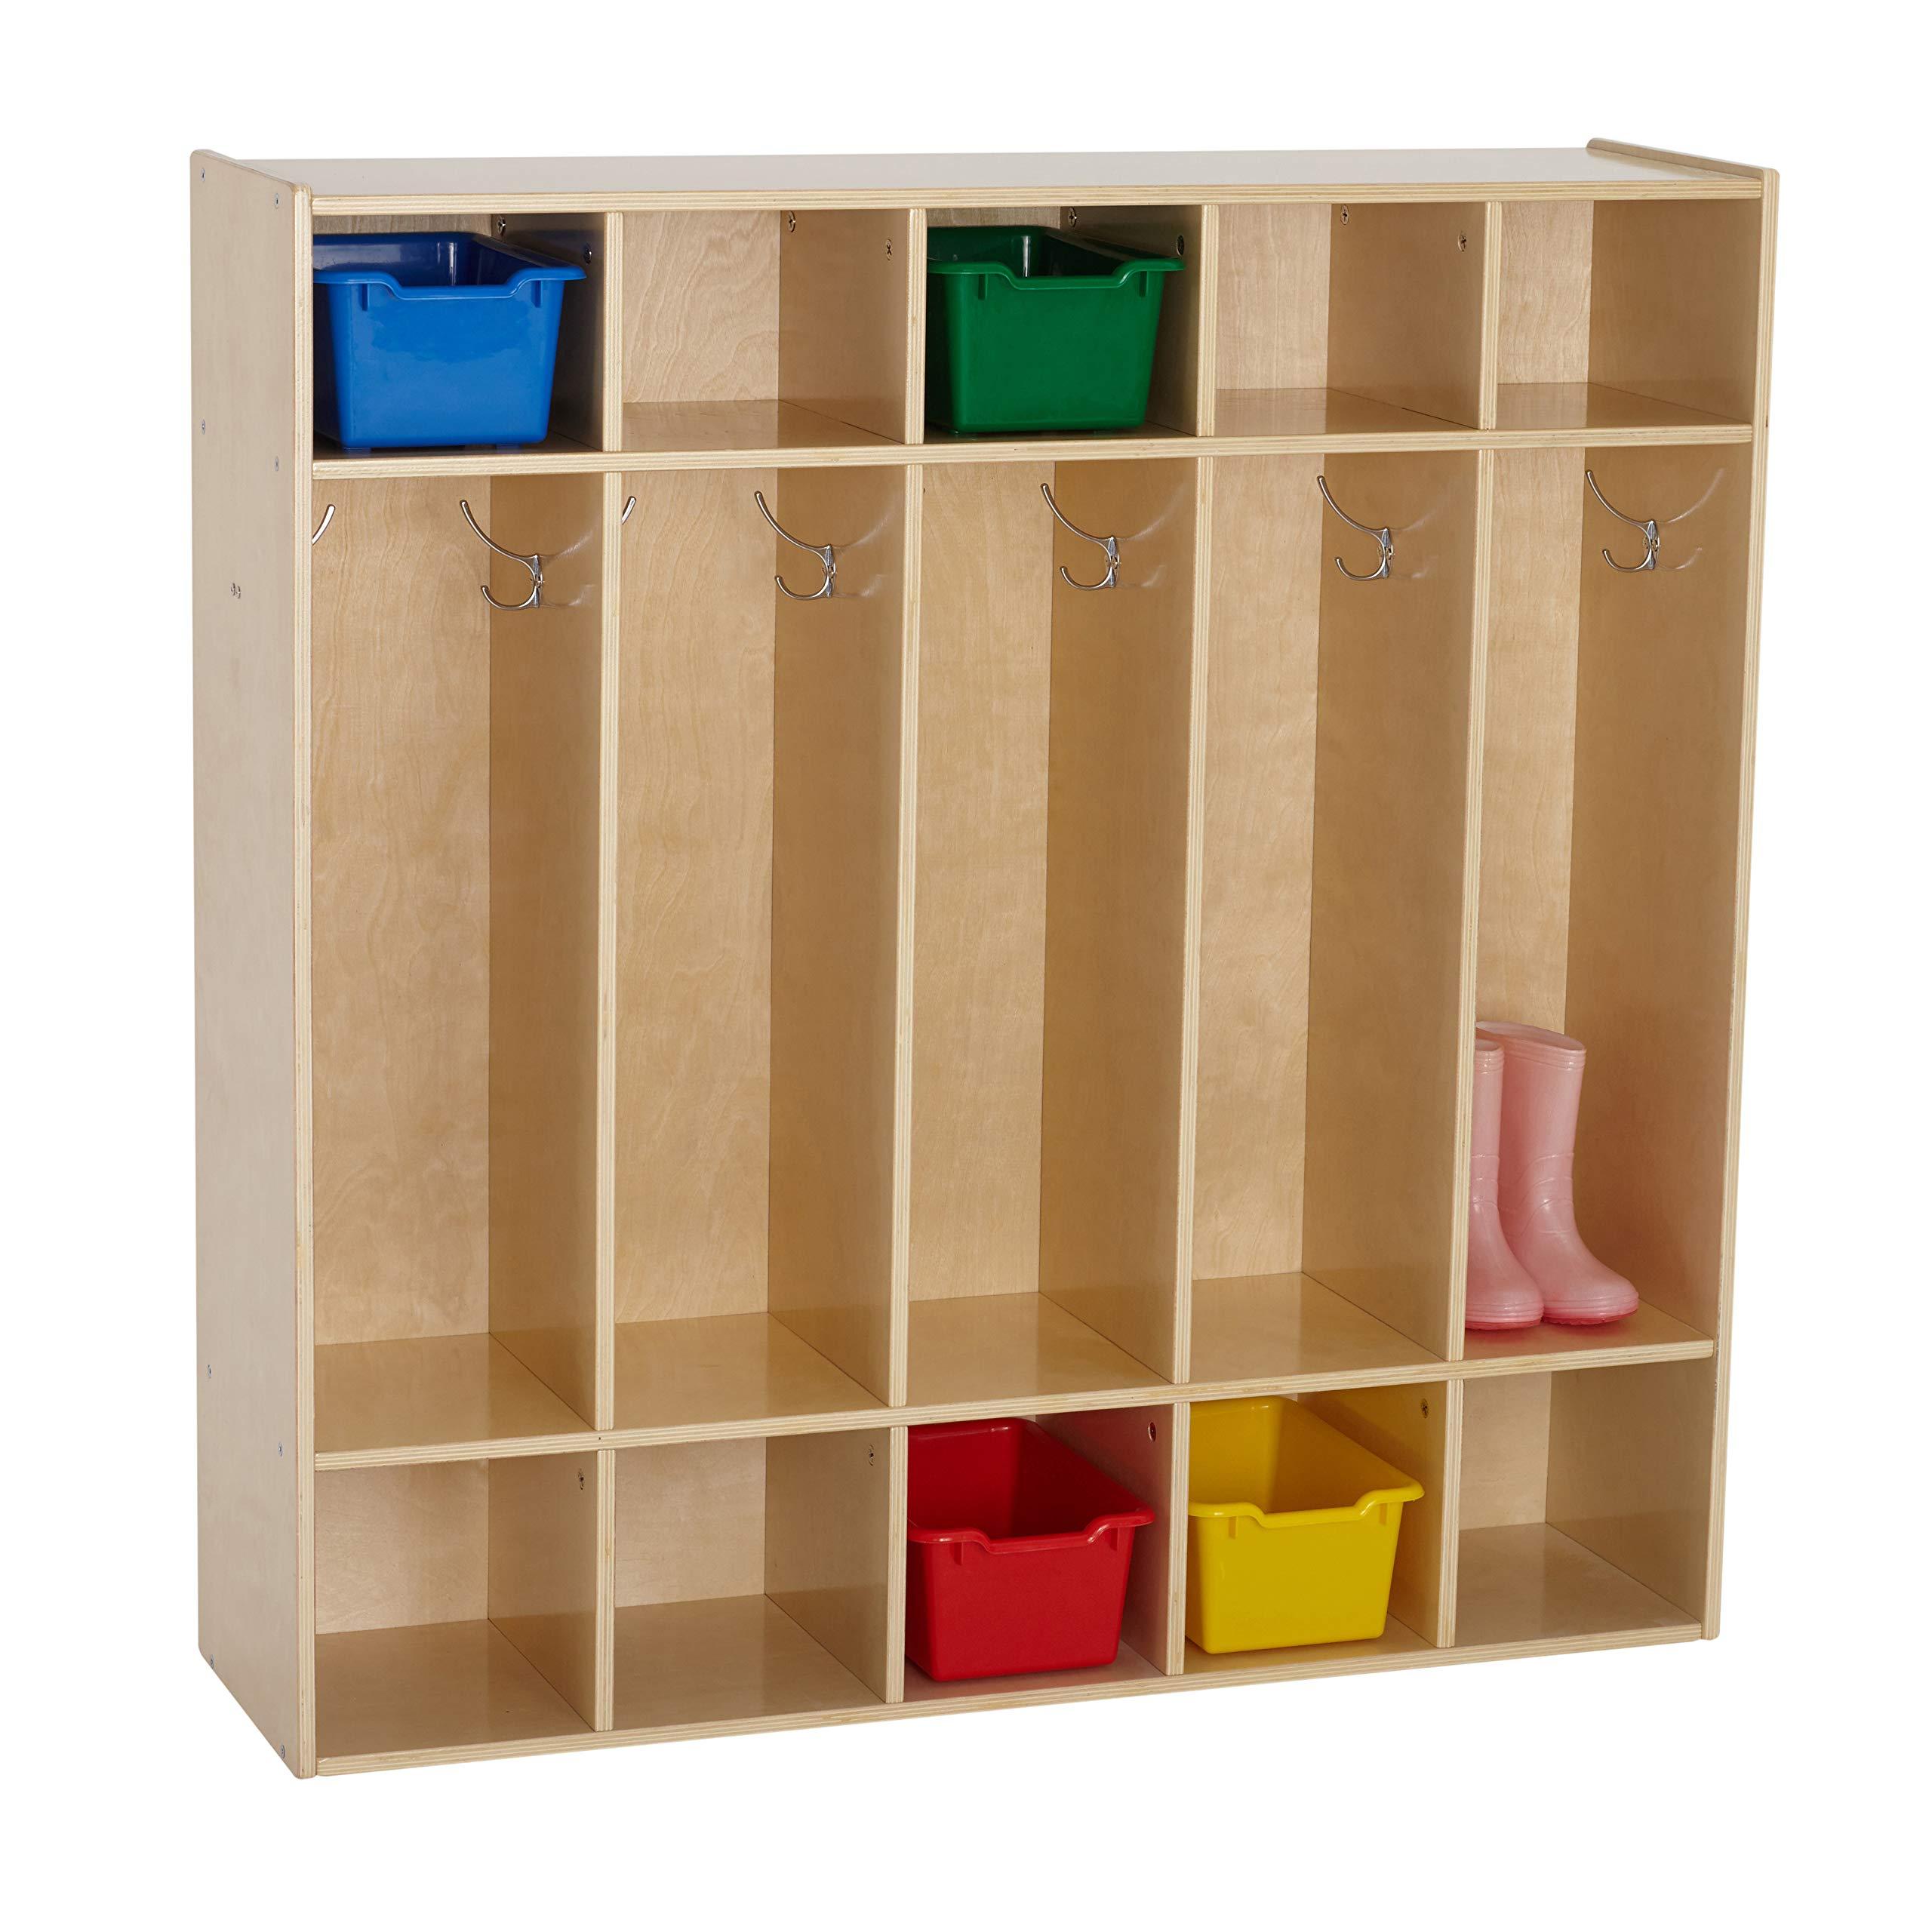 ECR4Kids Birch Streamline Classroom Locker   Hardwood Coat & Backpack Storage for Kids   5-Section, Standard (46'' H) by ECR4Kids